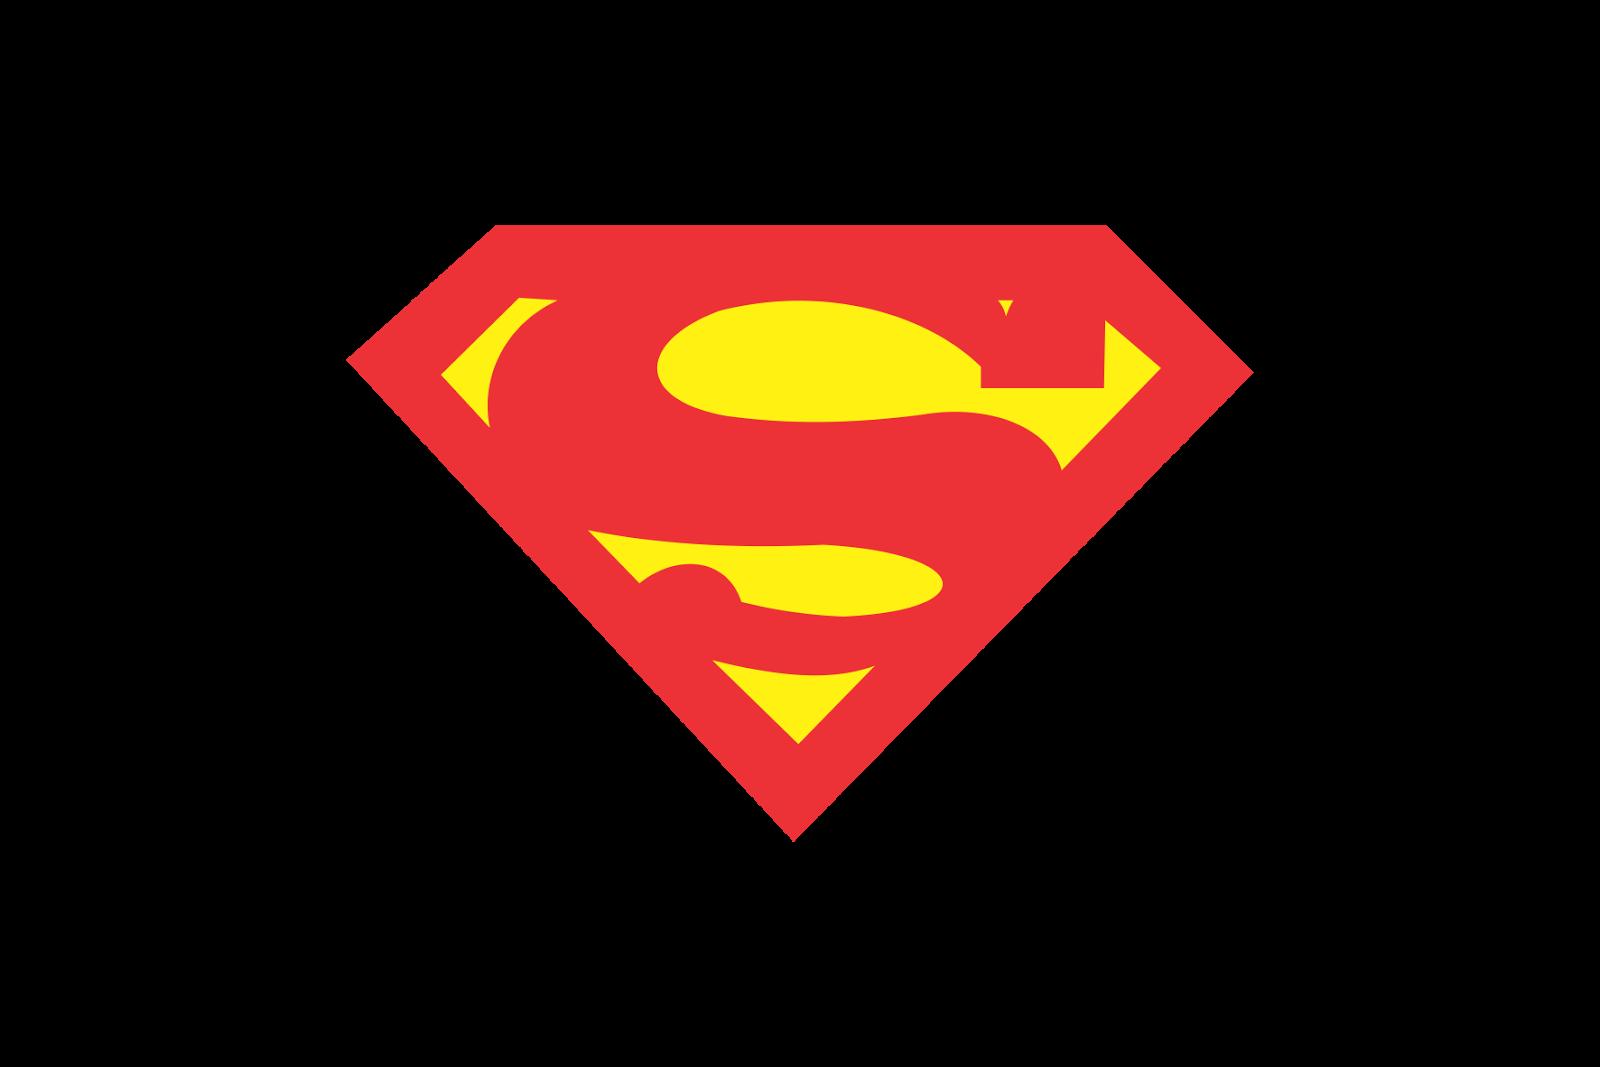 superman logo share logo rh share logo blogspot com superman logo vector download superman vector logo png